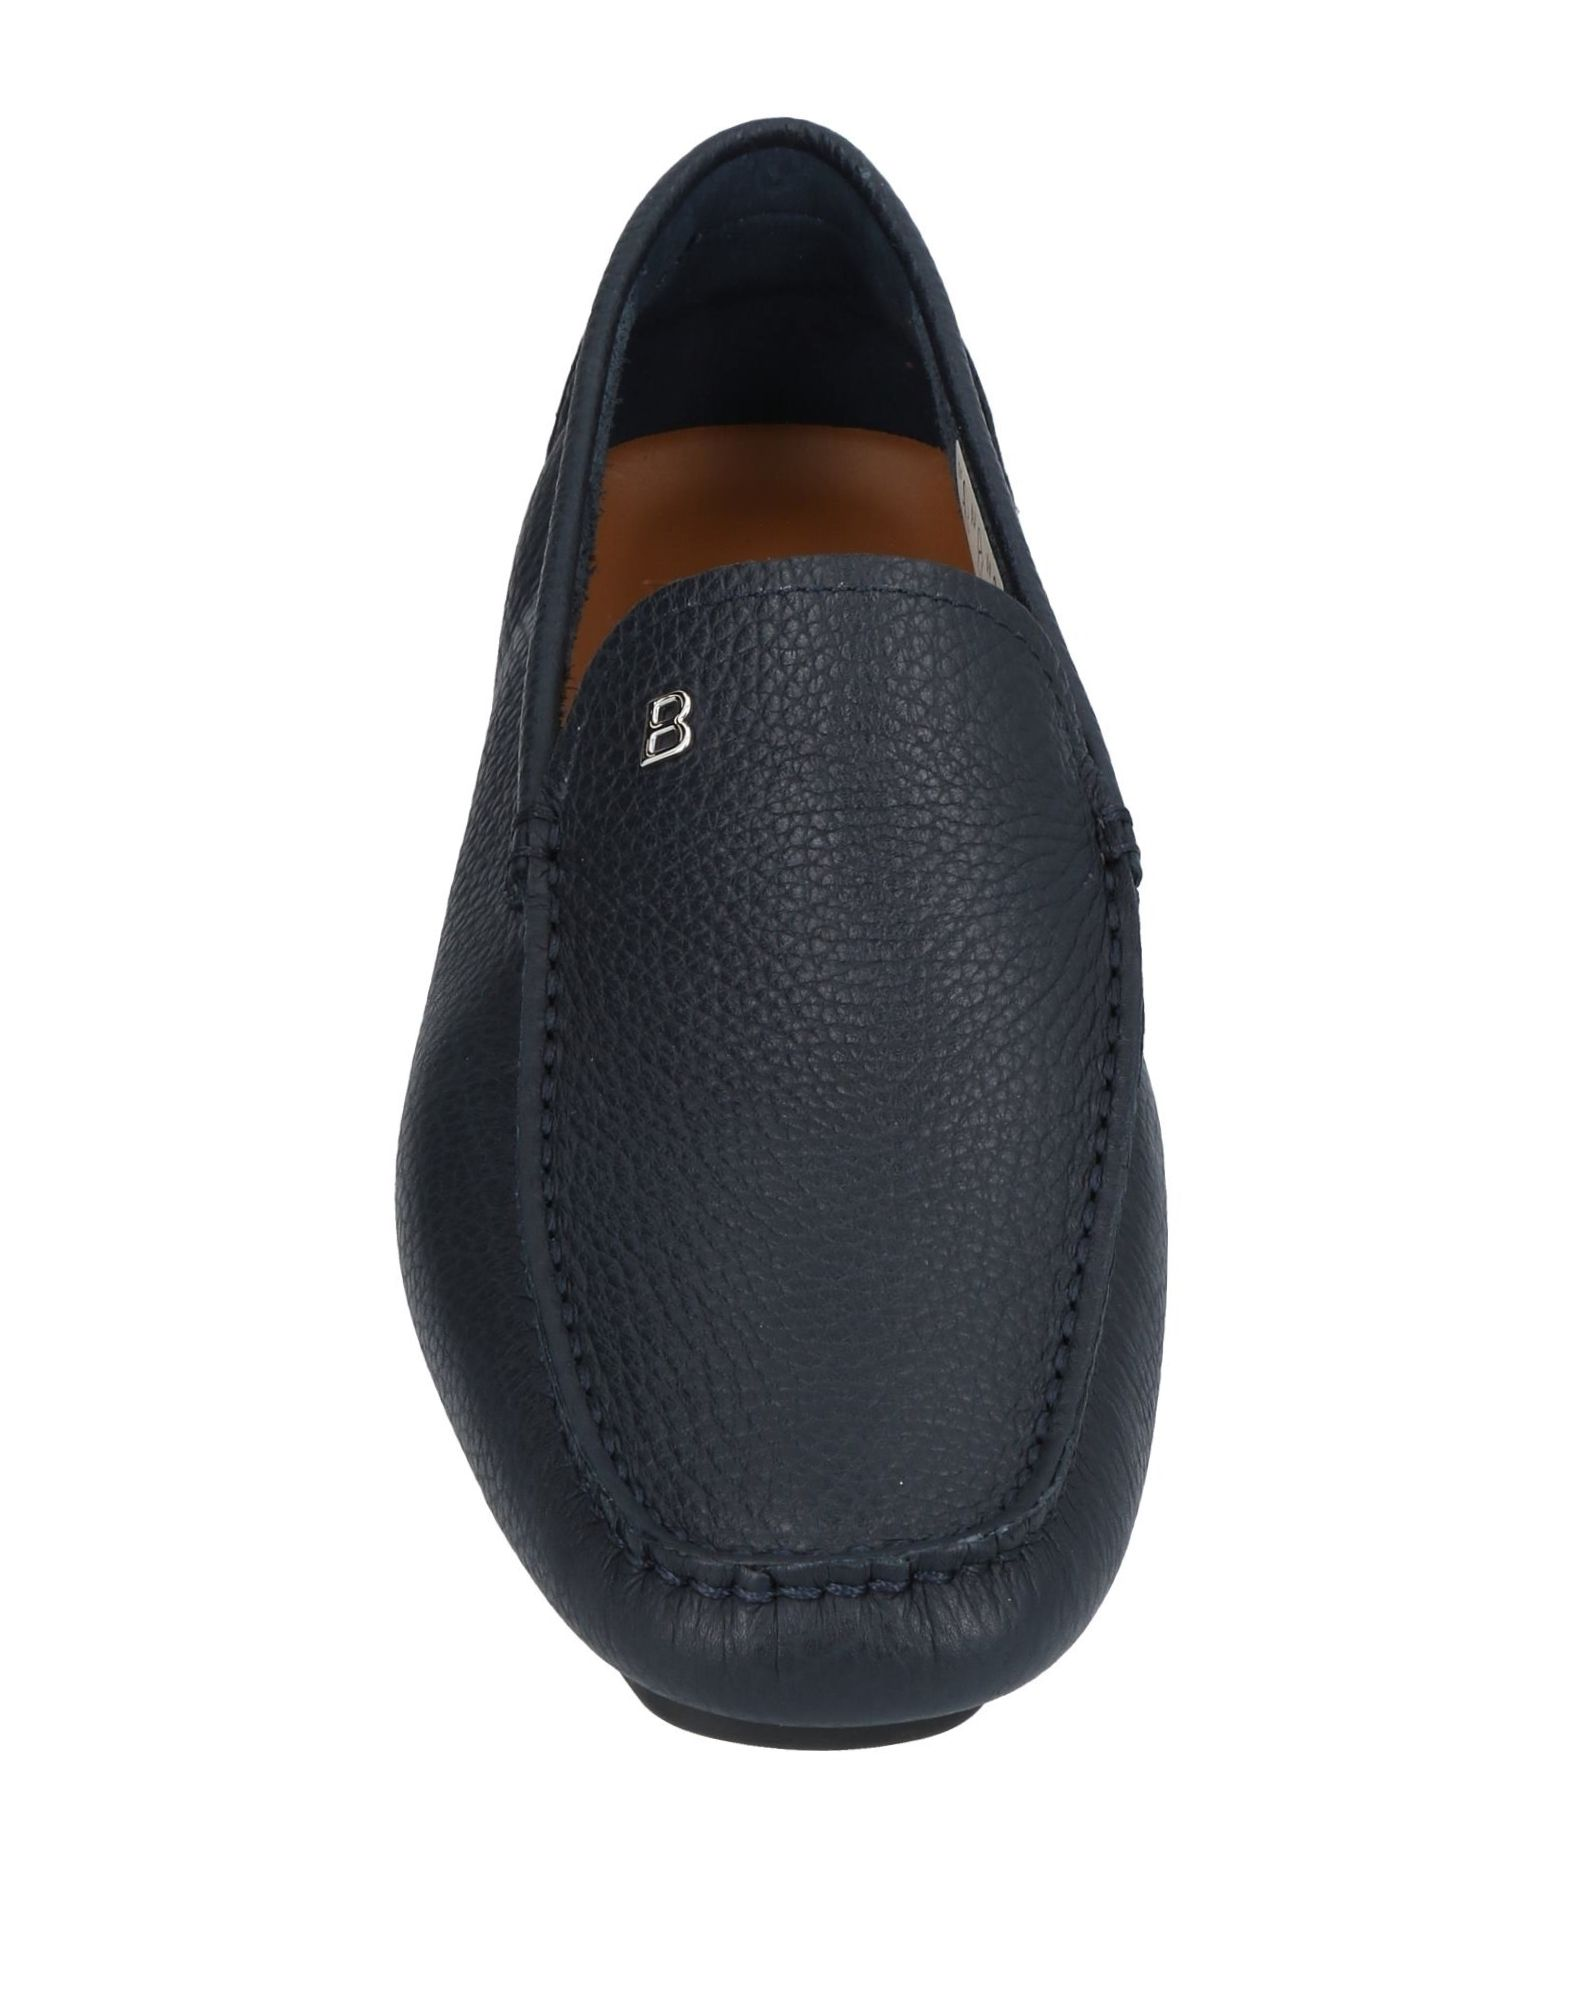 Bally Mokassins Schuhe Herren  11461238NT Heiße Schuhe Mokassins 763dc7